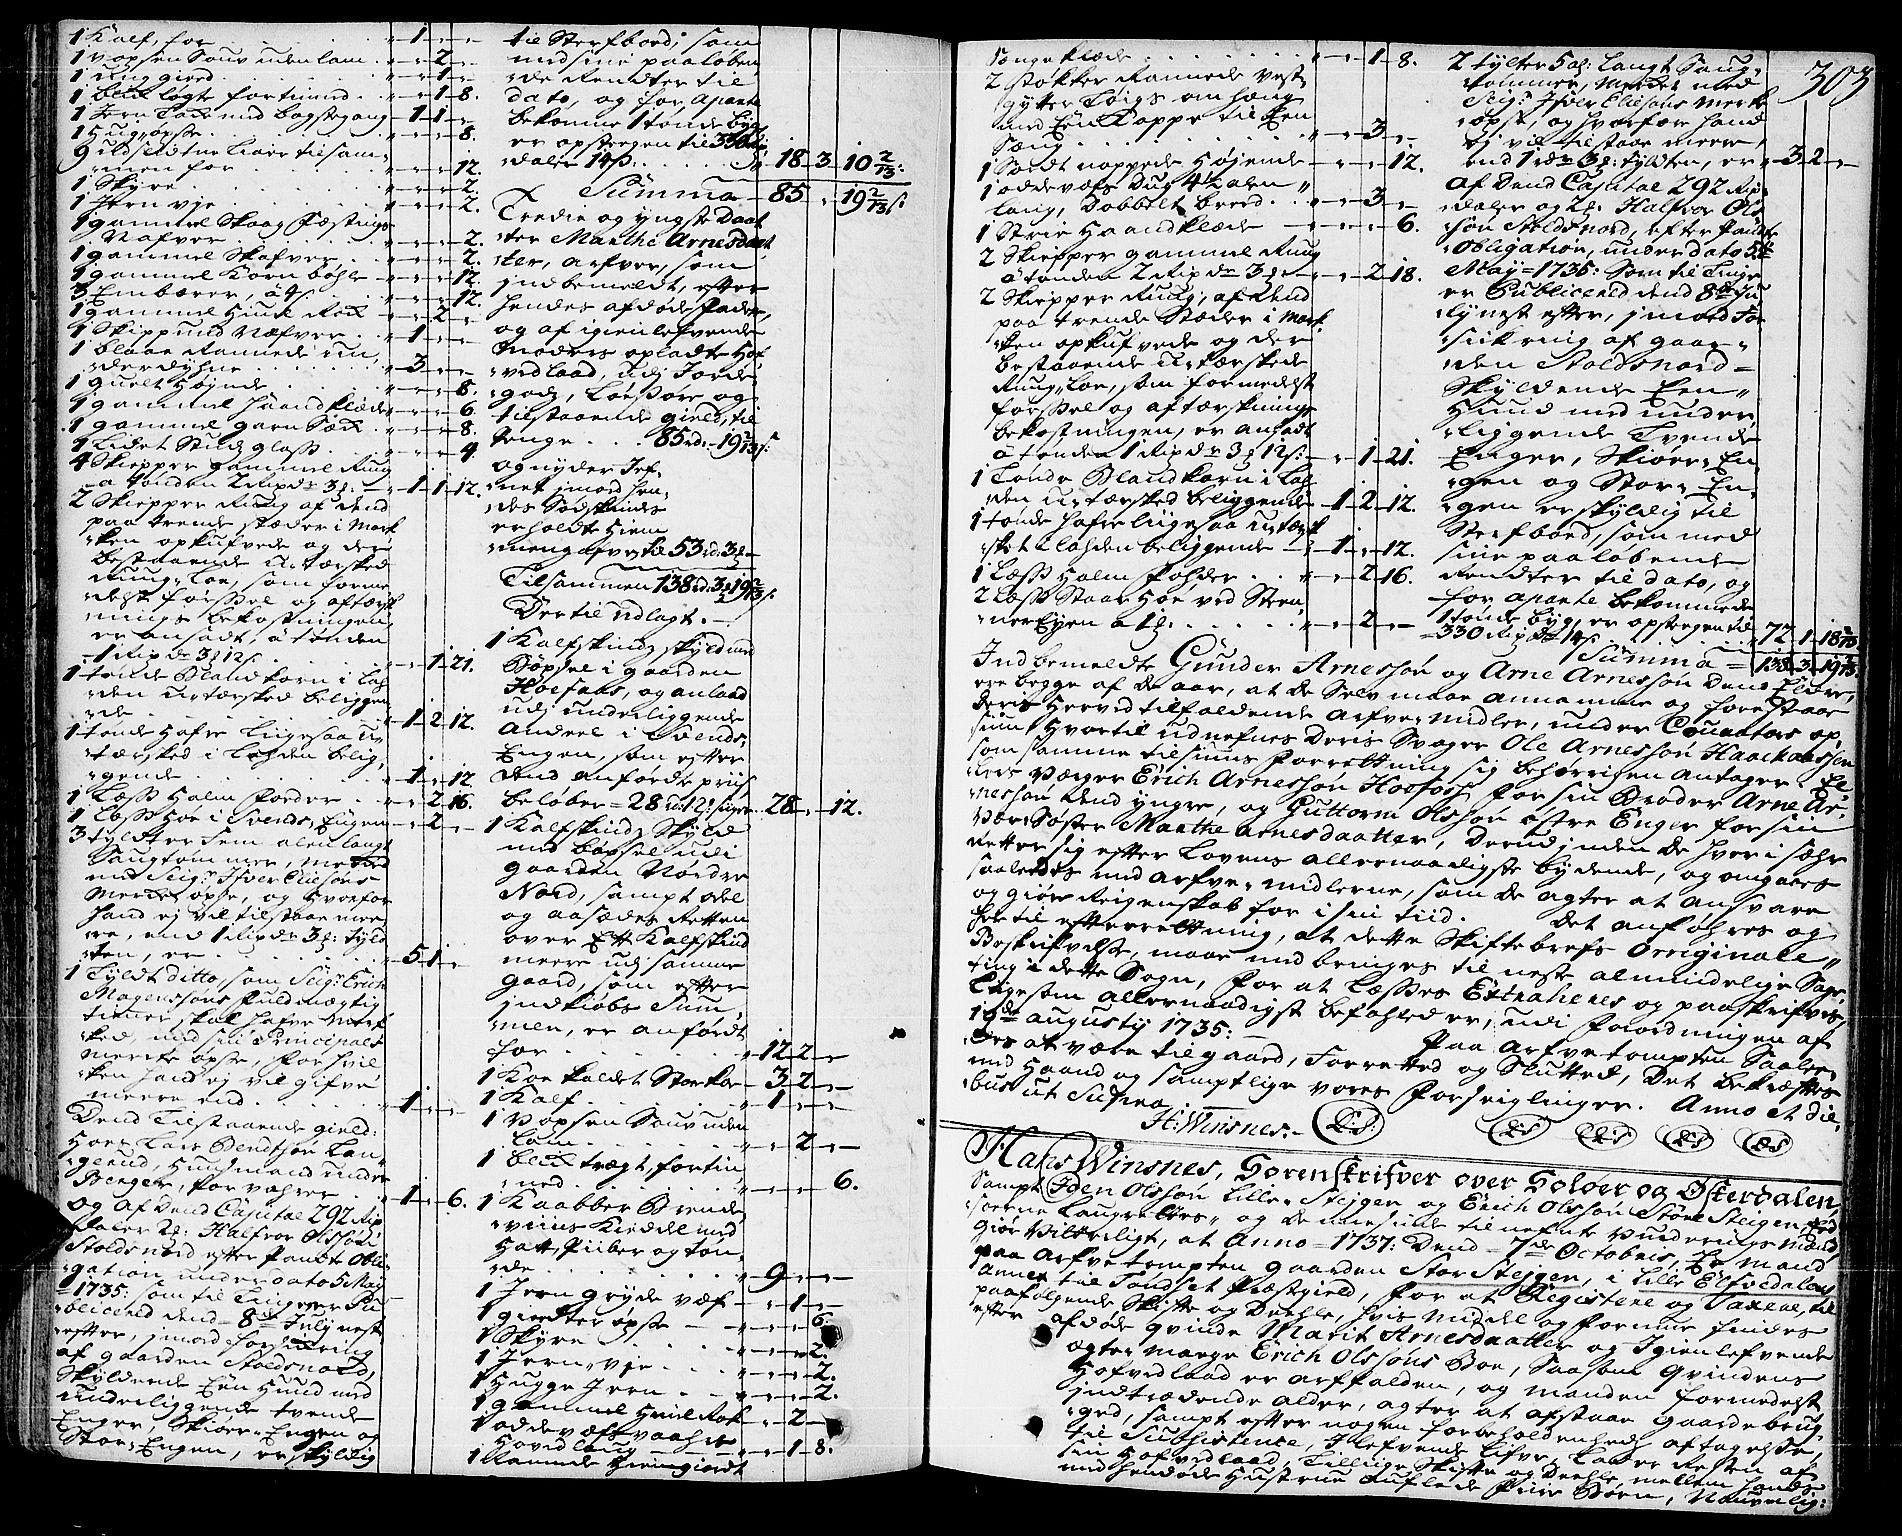 SAH, Solør og Østerdalen sorenskriveri, J/Ja/L0005: Skifteprotokoll, 1735-1738, s. 302b-303a